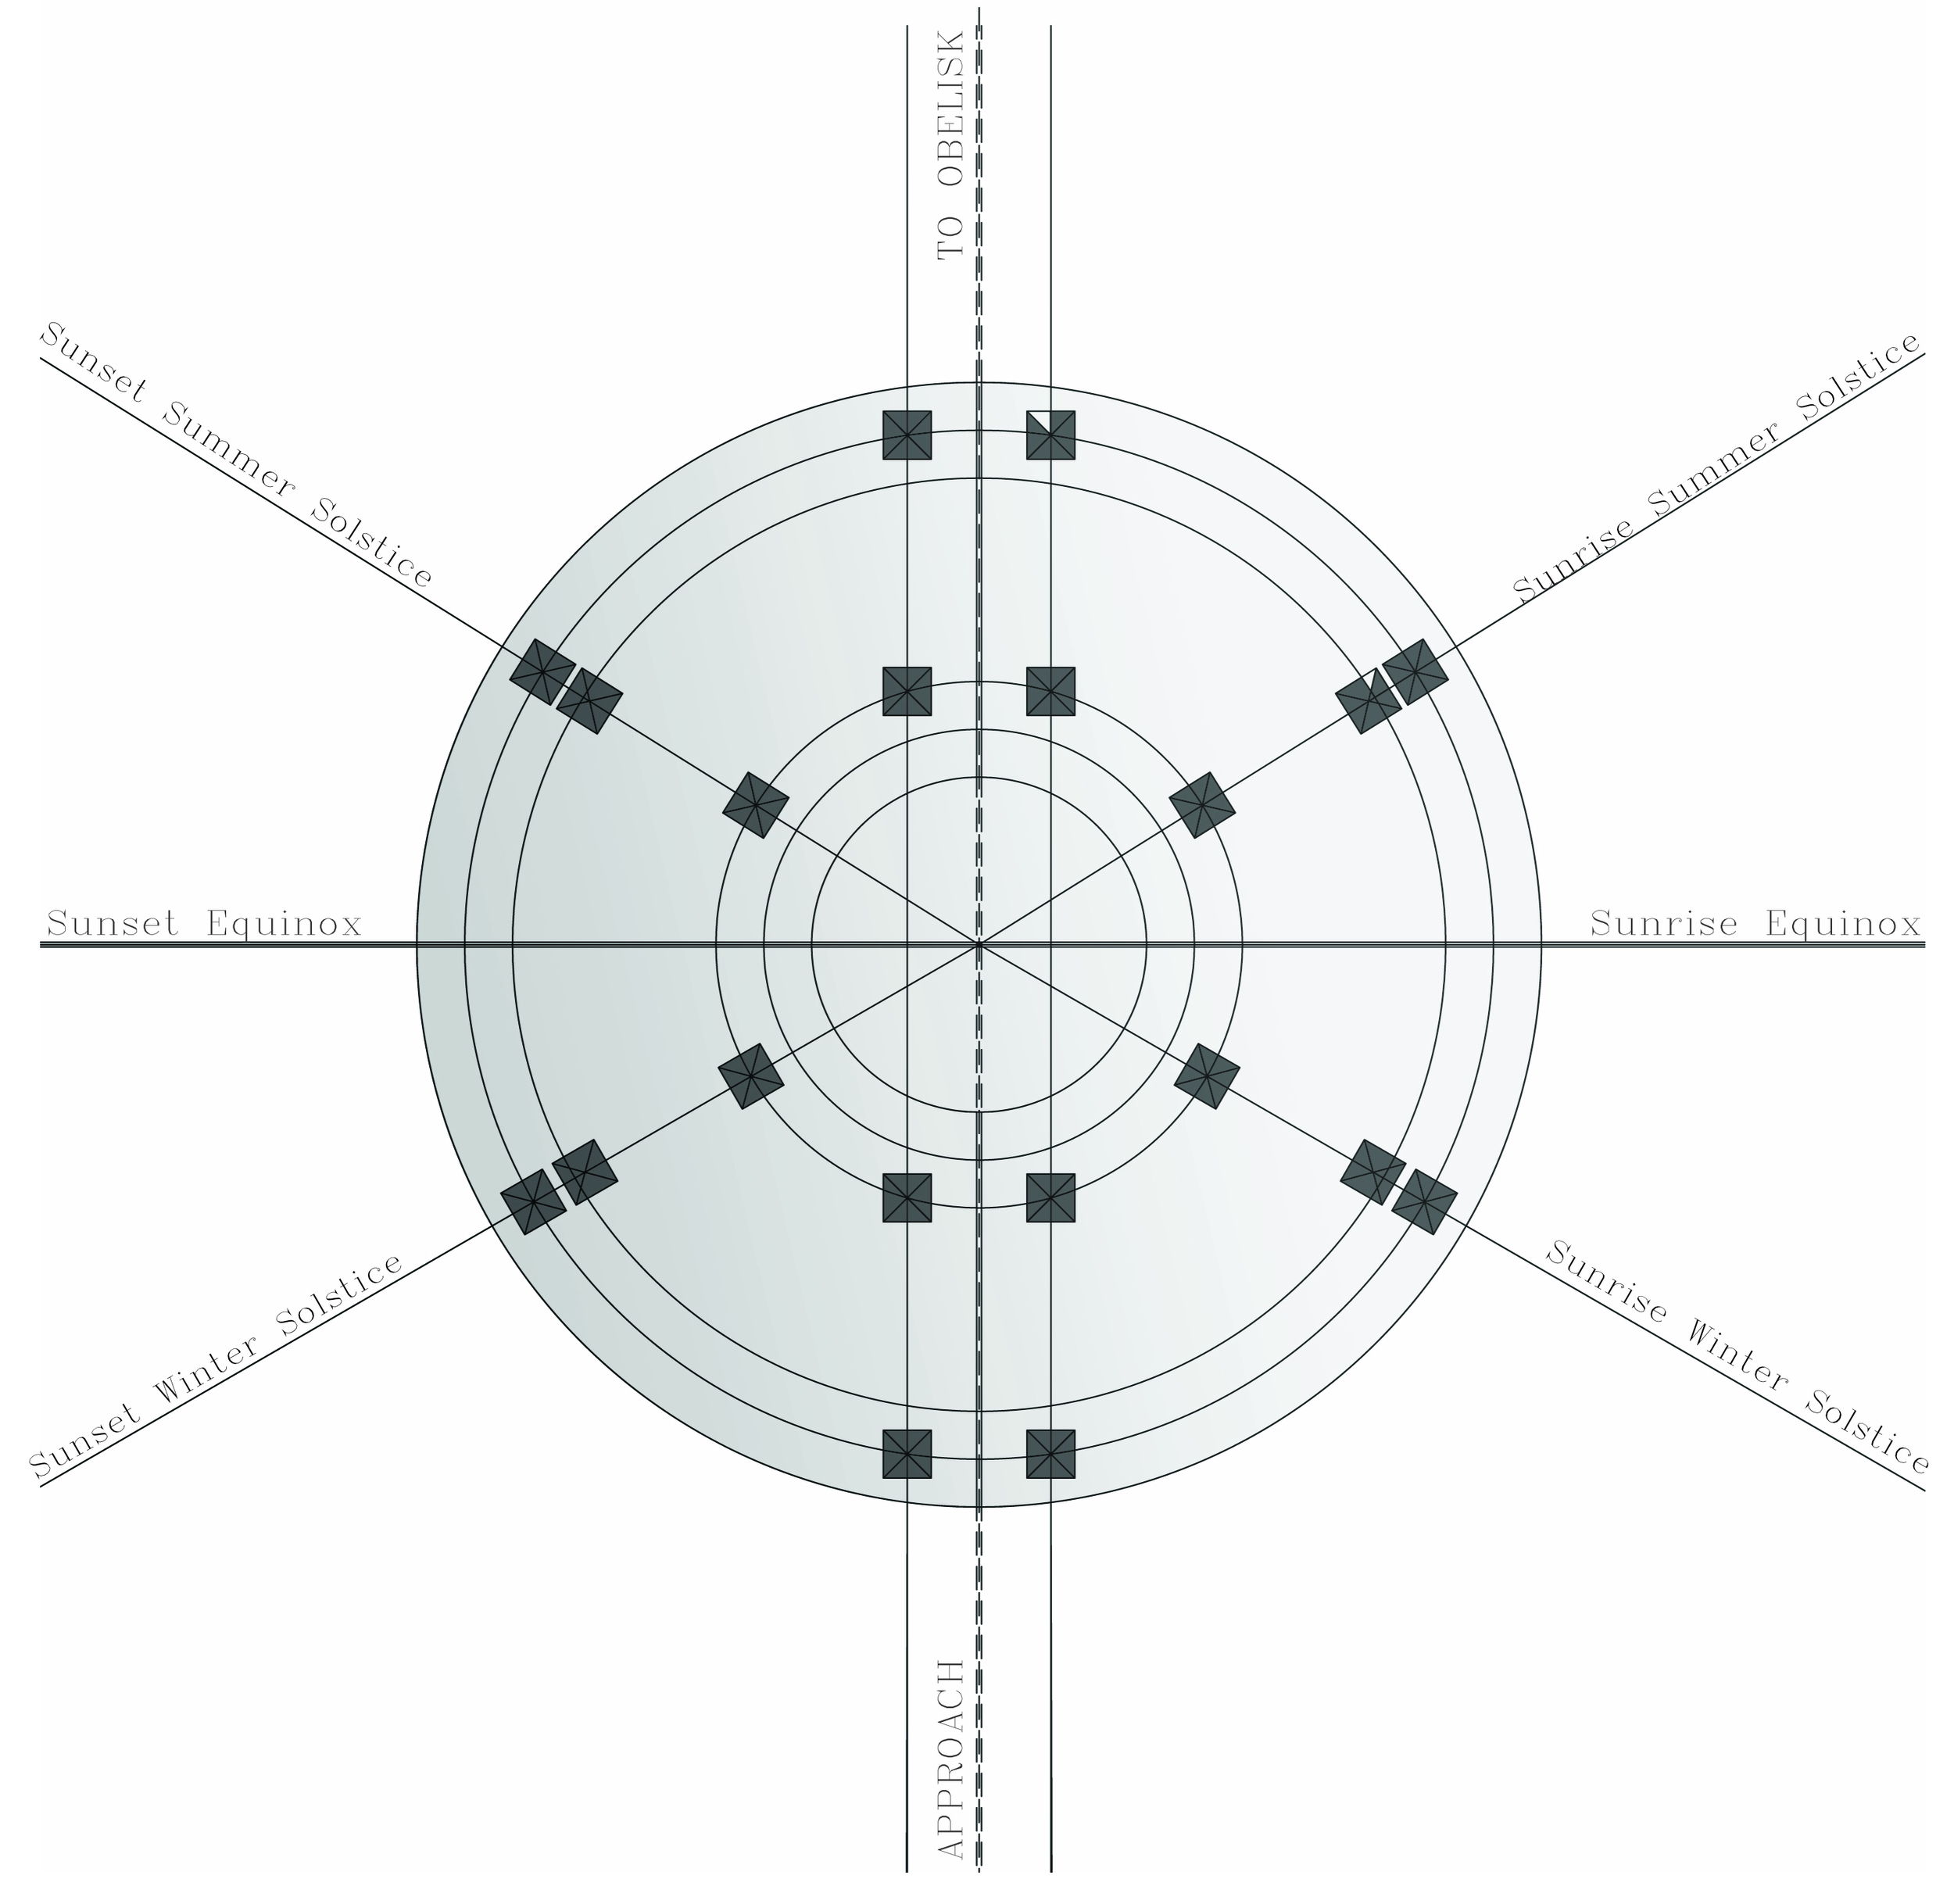 3 LIONarchitecture Plan Diagram.jpg